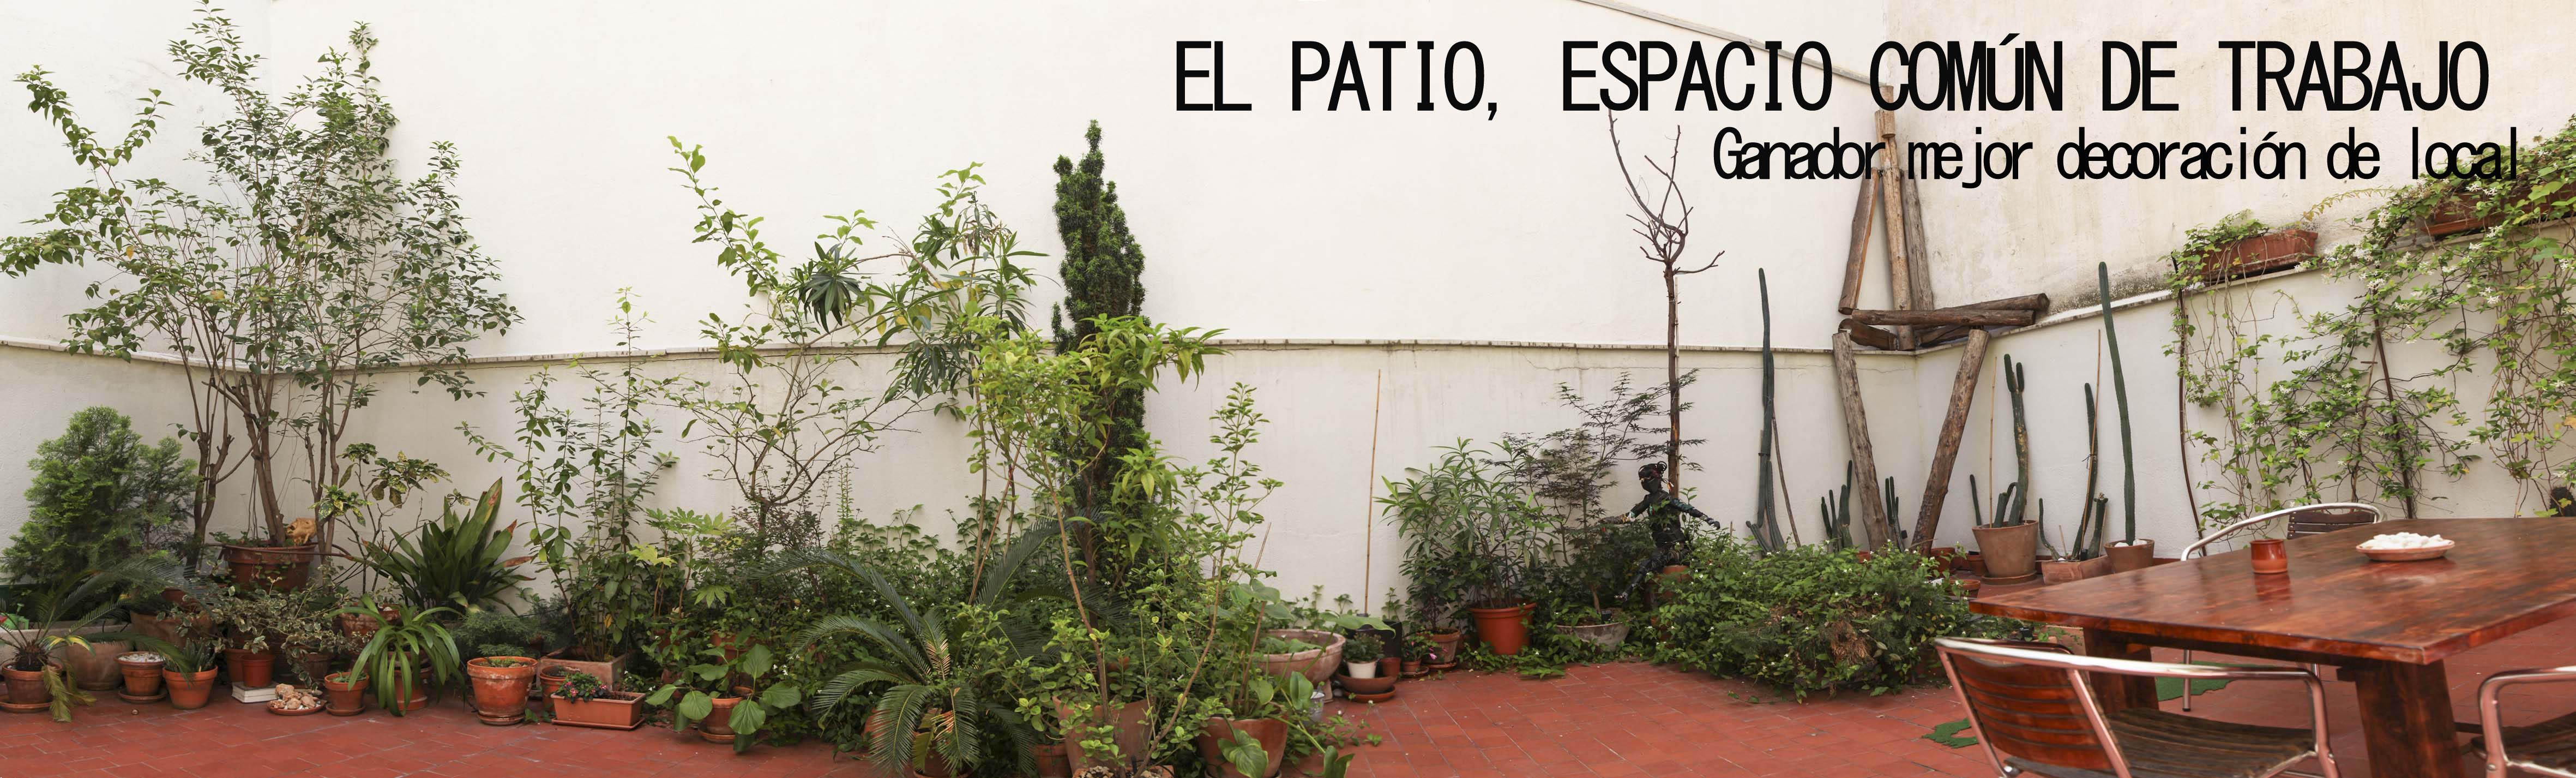 Elpatio_rebrota_malasana_rojomenta_ganadores_concurso_balcones_madrid